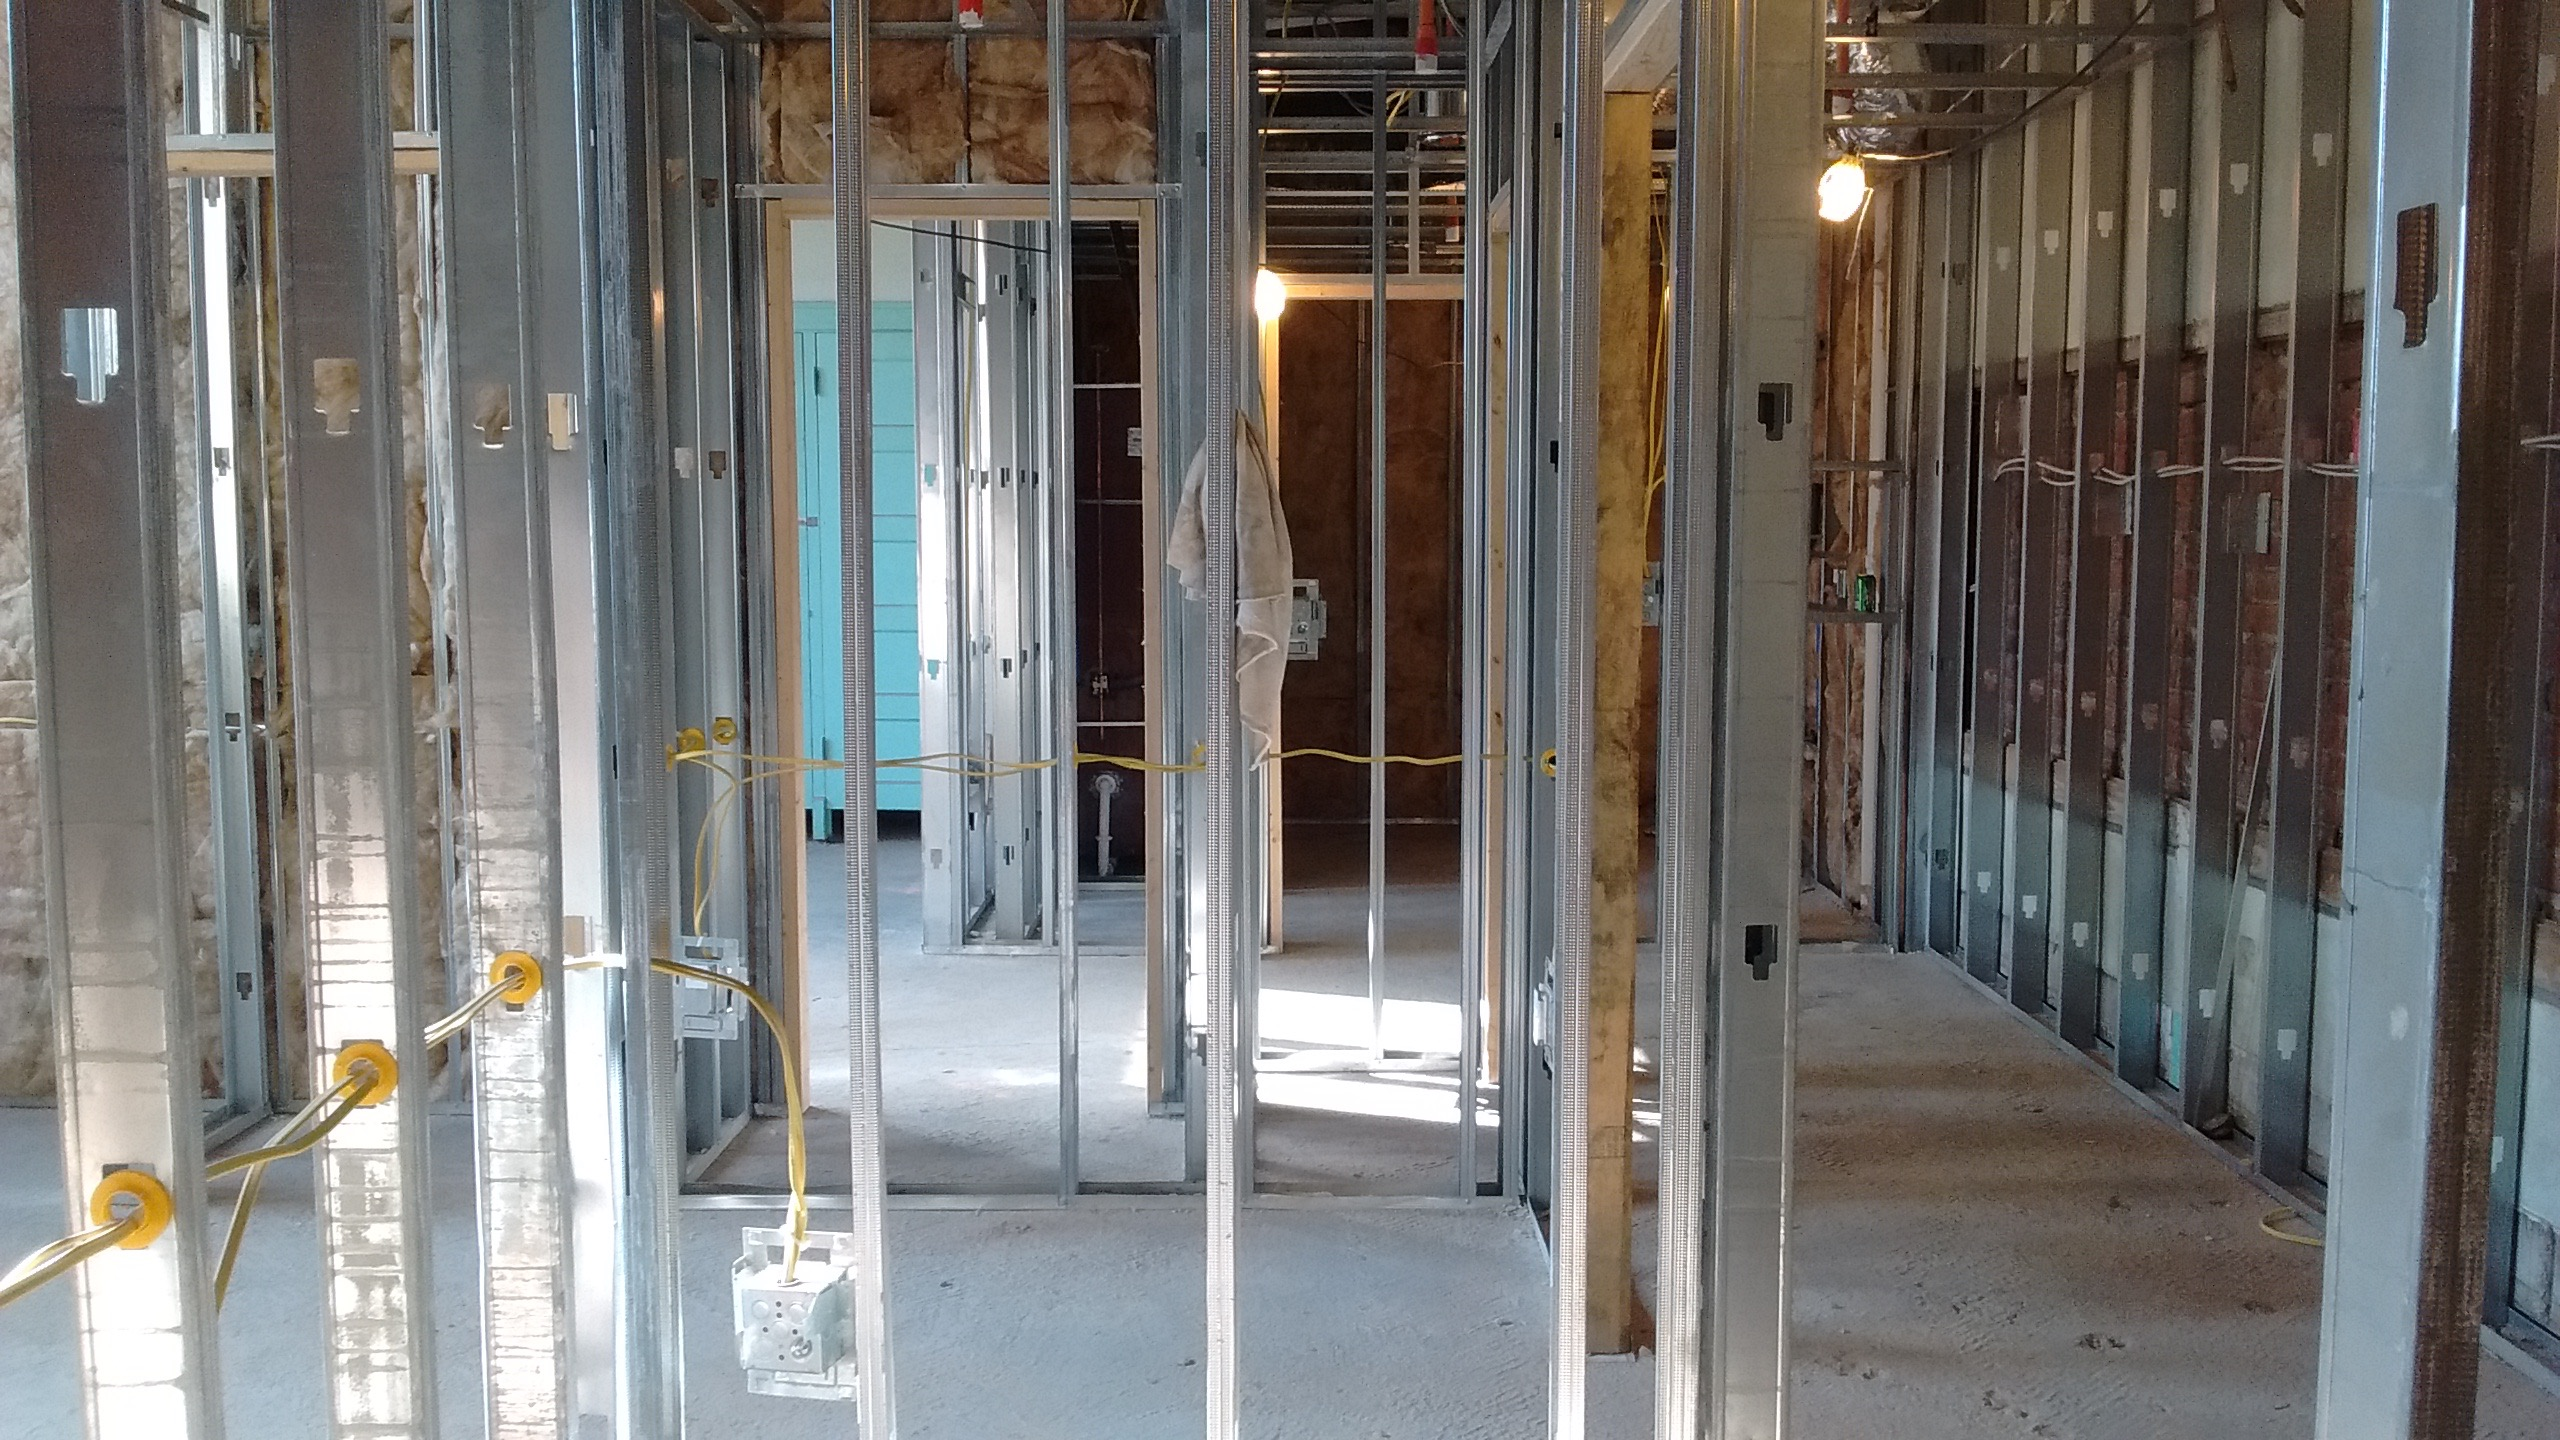 Construction proceeds on a living unit